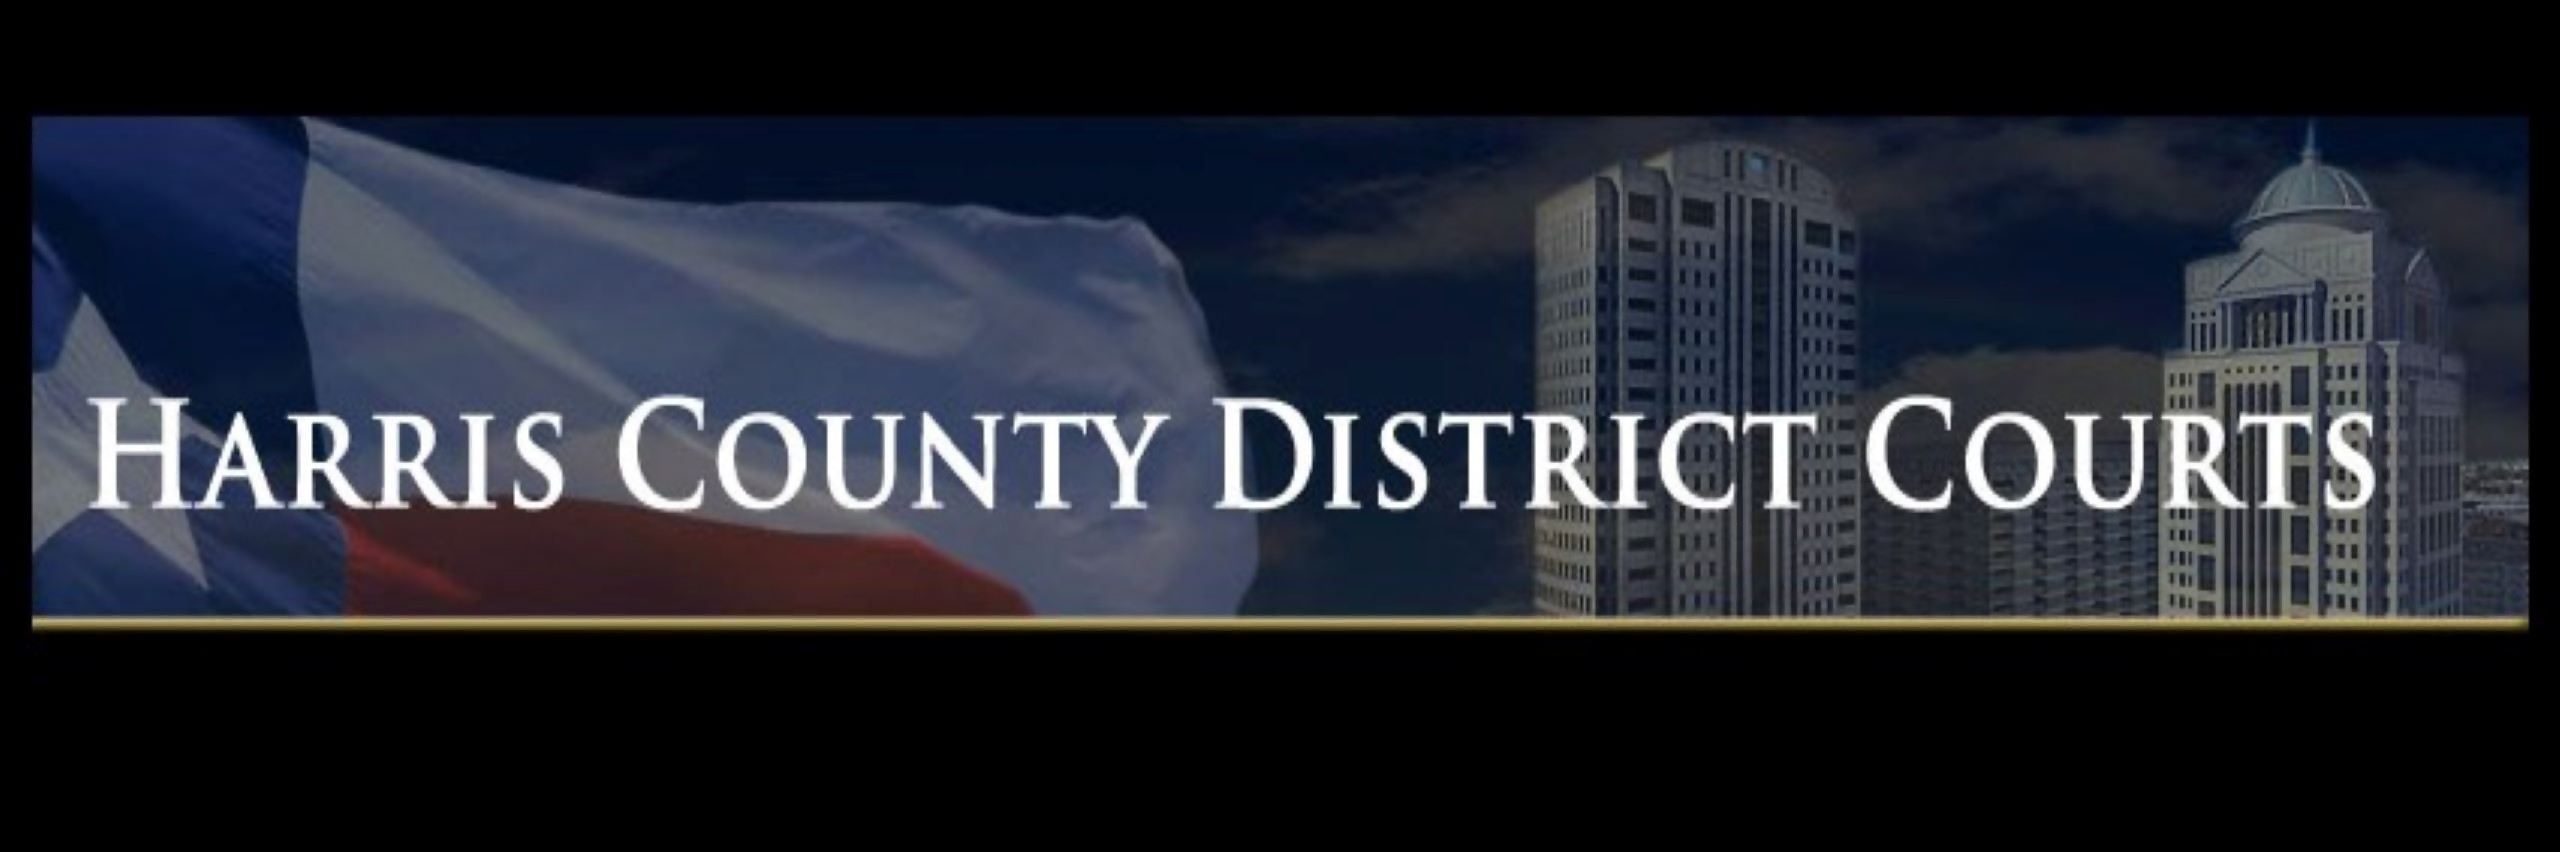 164th District Court - Live Stream